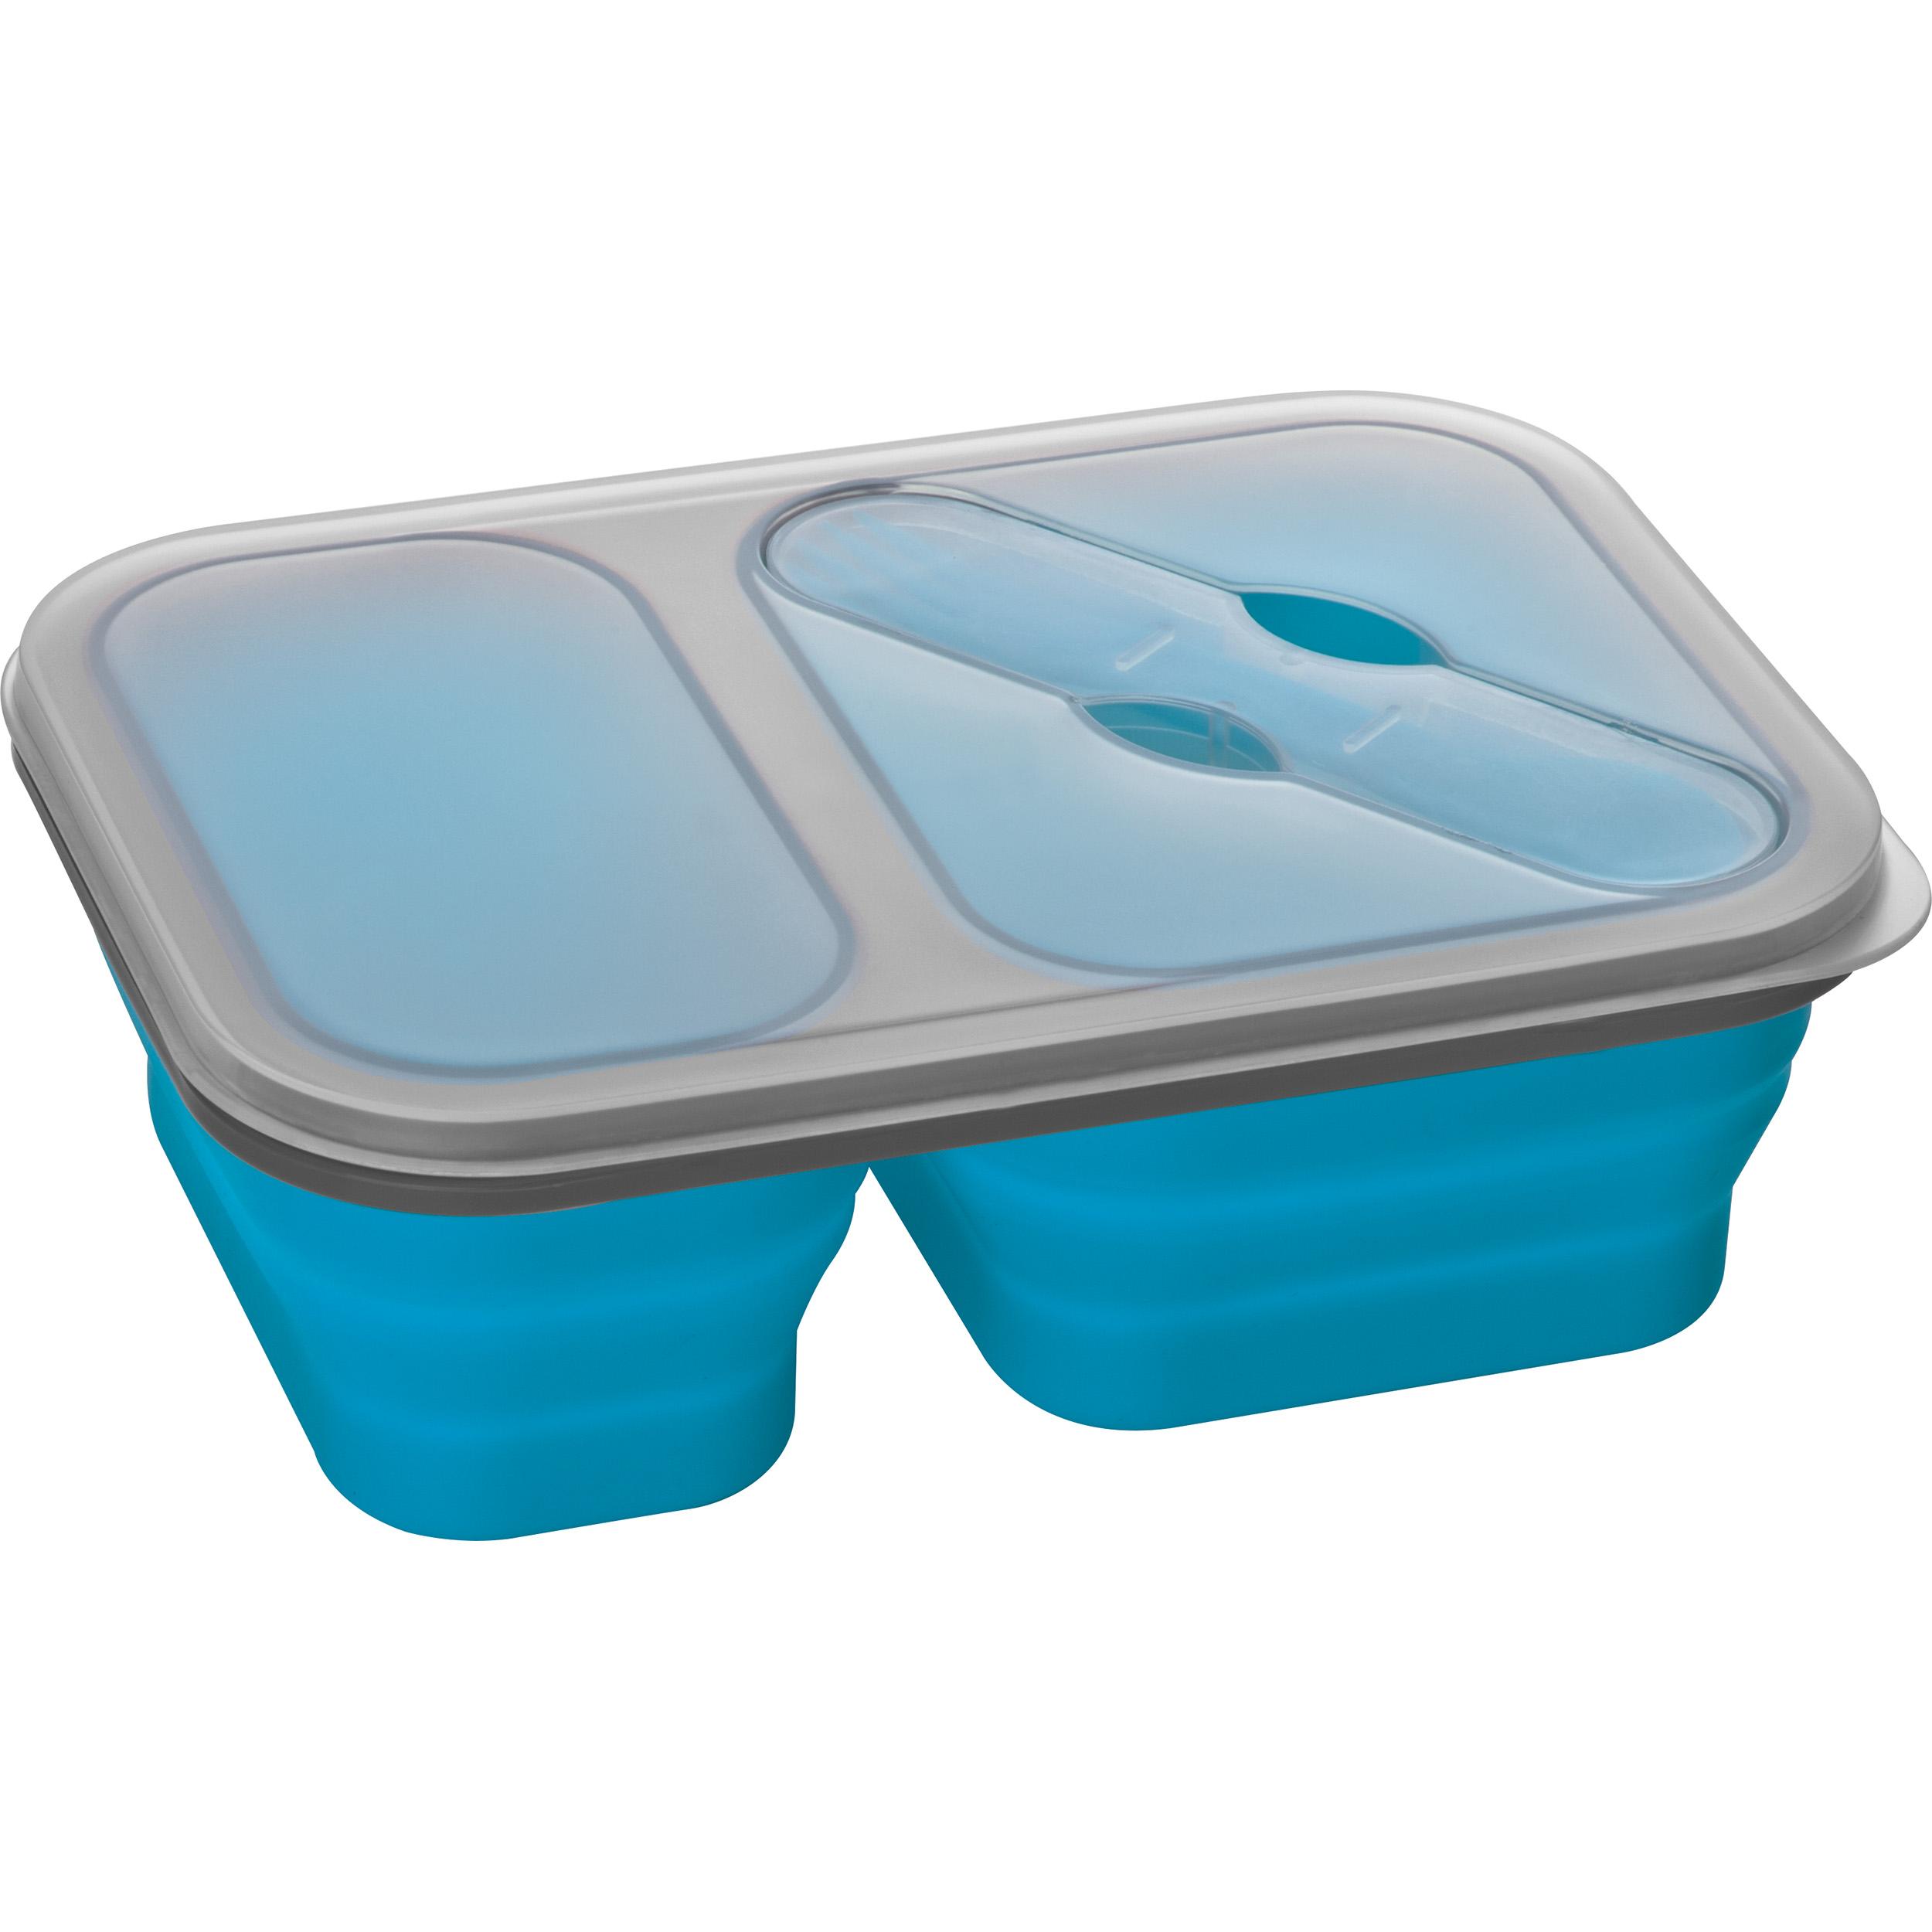 Foldable silicon bowl - big